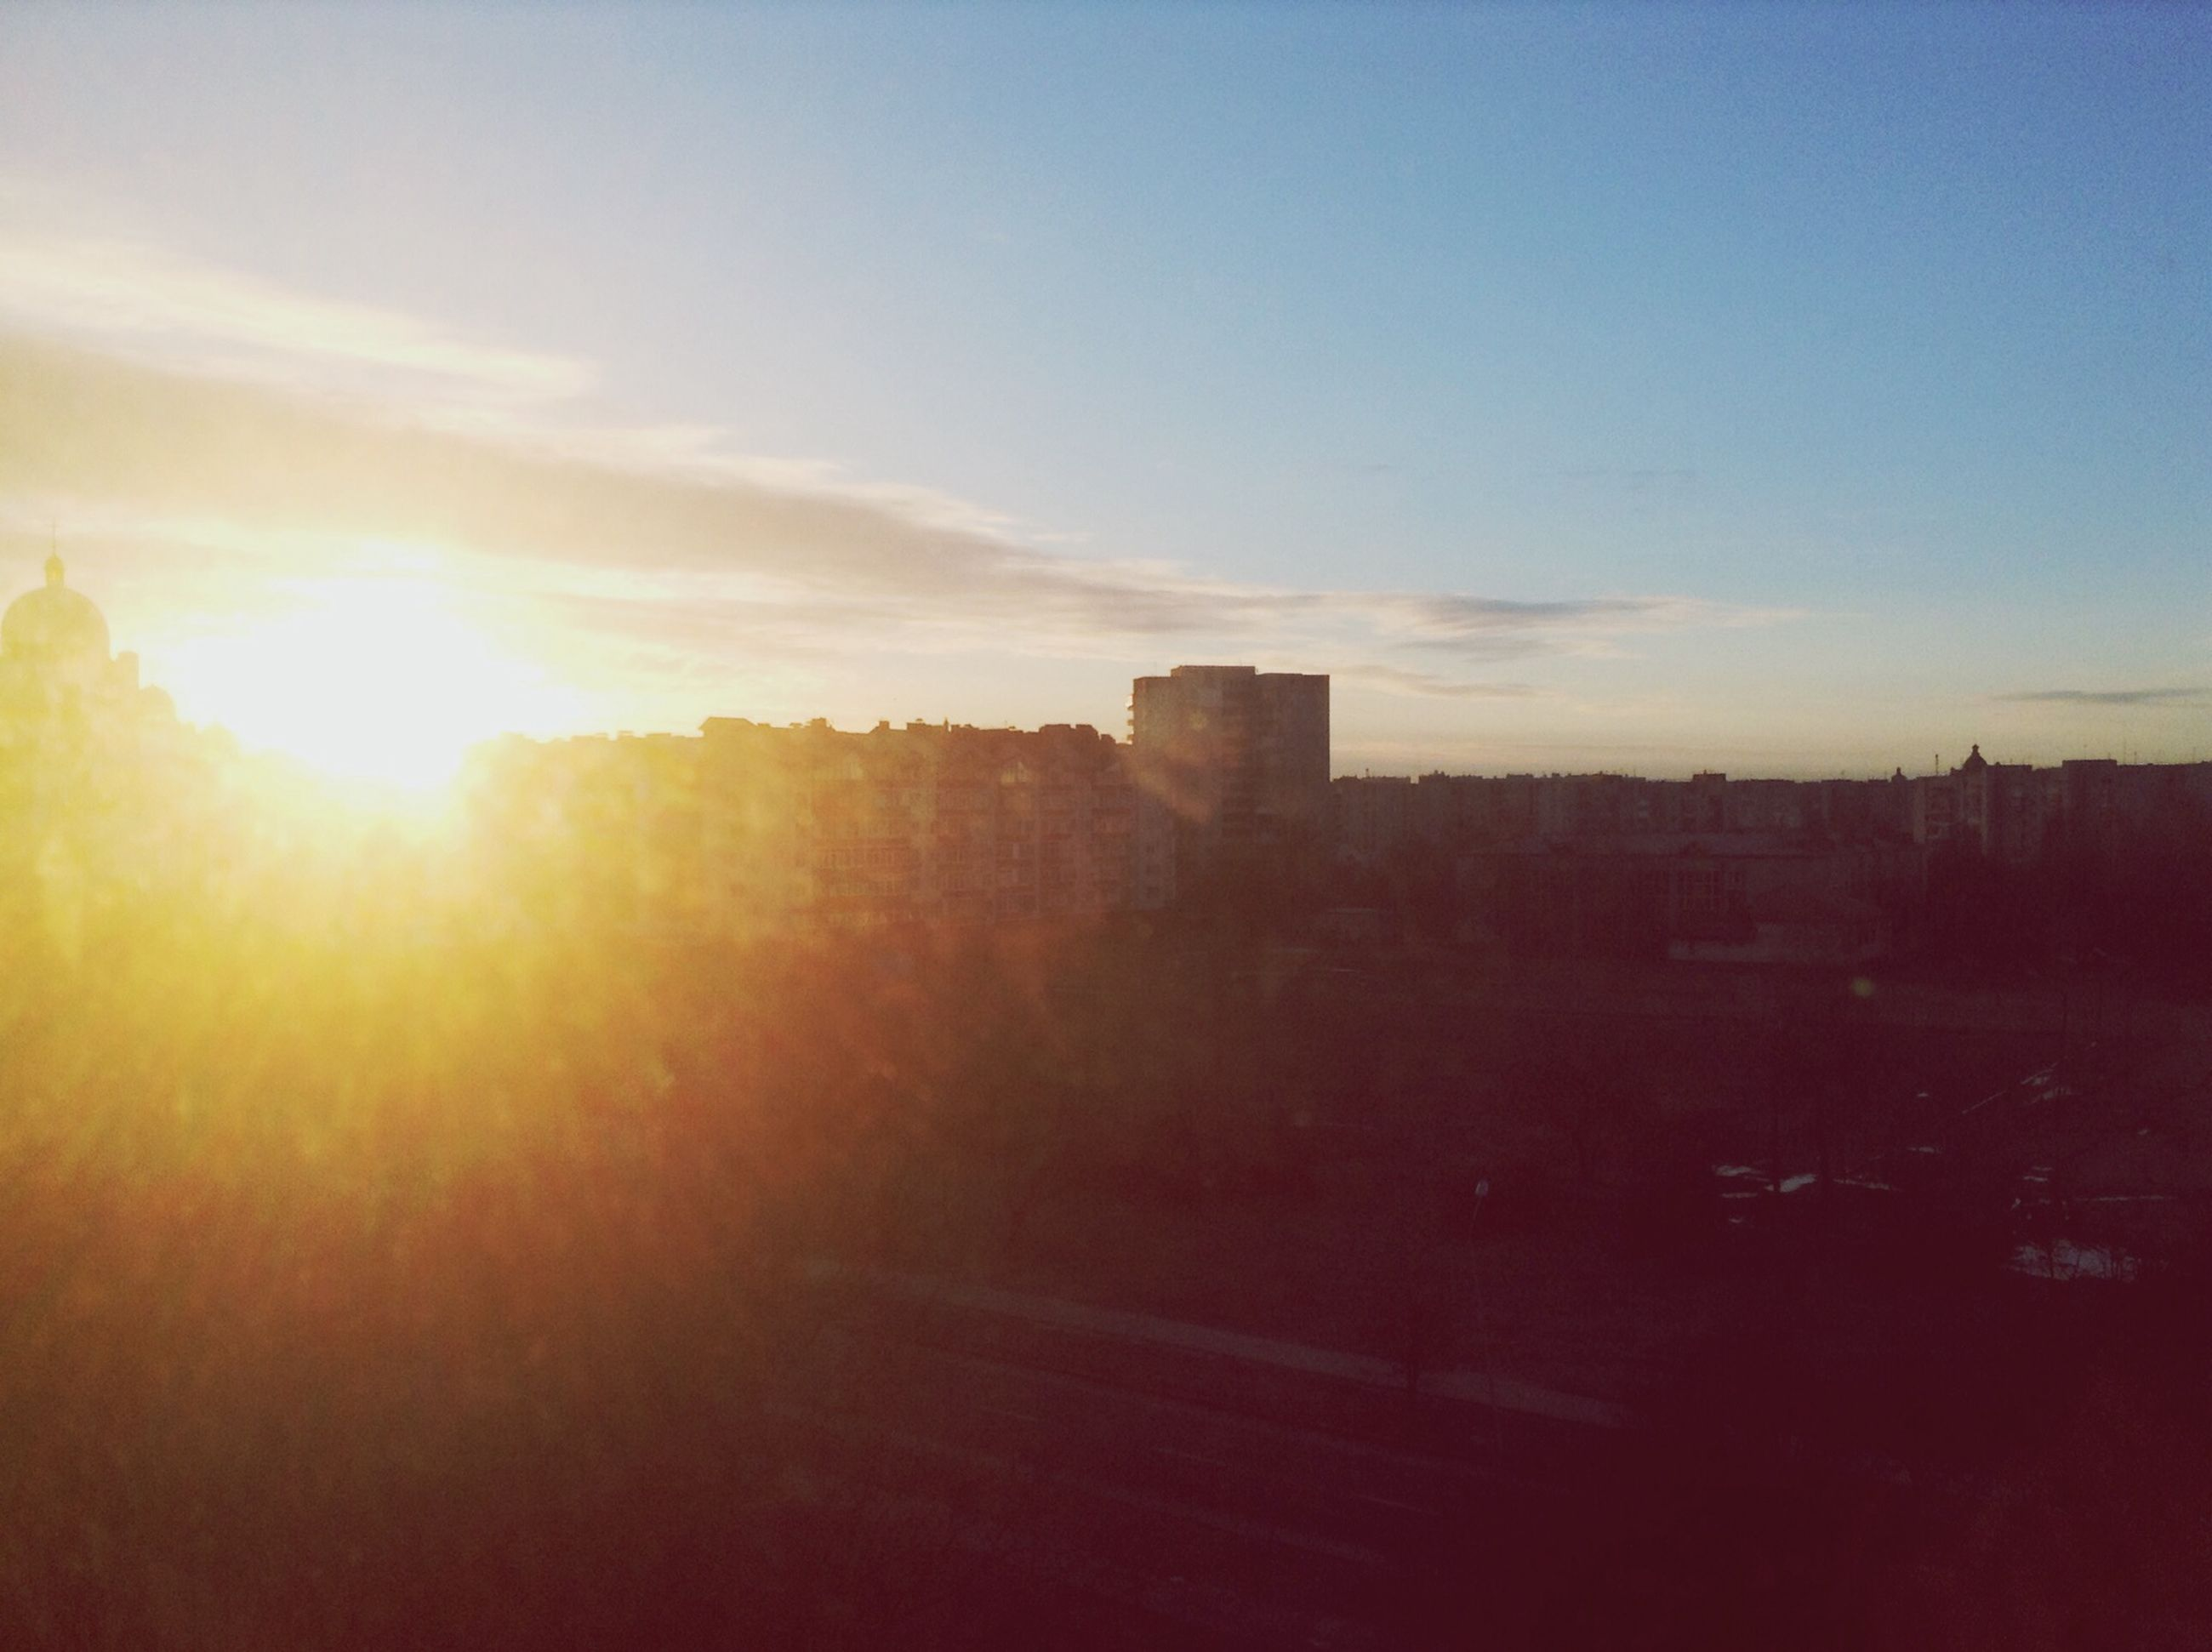 sunset, building exterior, sun, architecture, built structure, sunlight, sunbeam, sky, city, lens flare, cityscape, silhouette, outdoors, residential structure, orange color, residential building, no people, nature, building, scenics